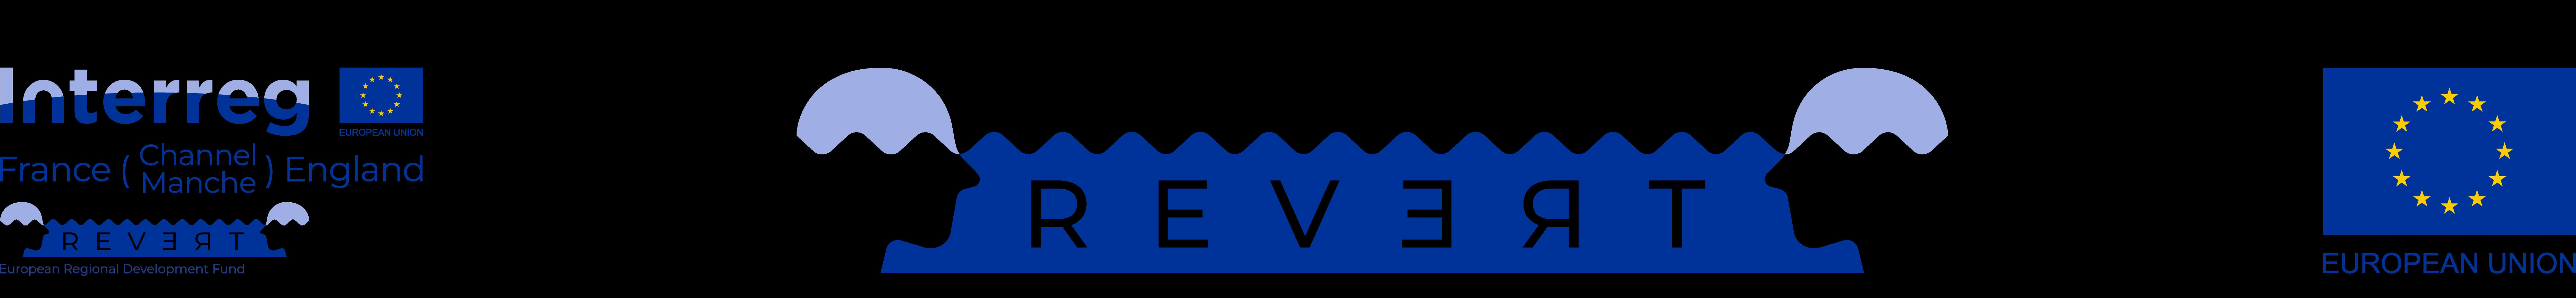 REVERT project / Interreg